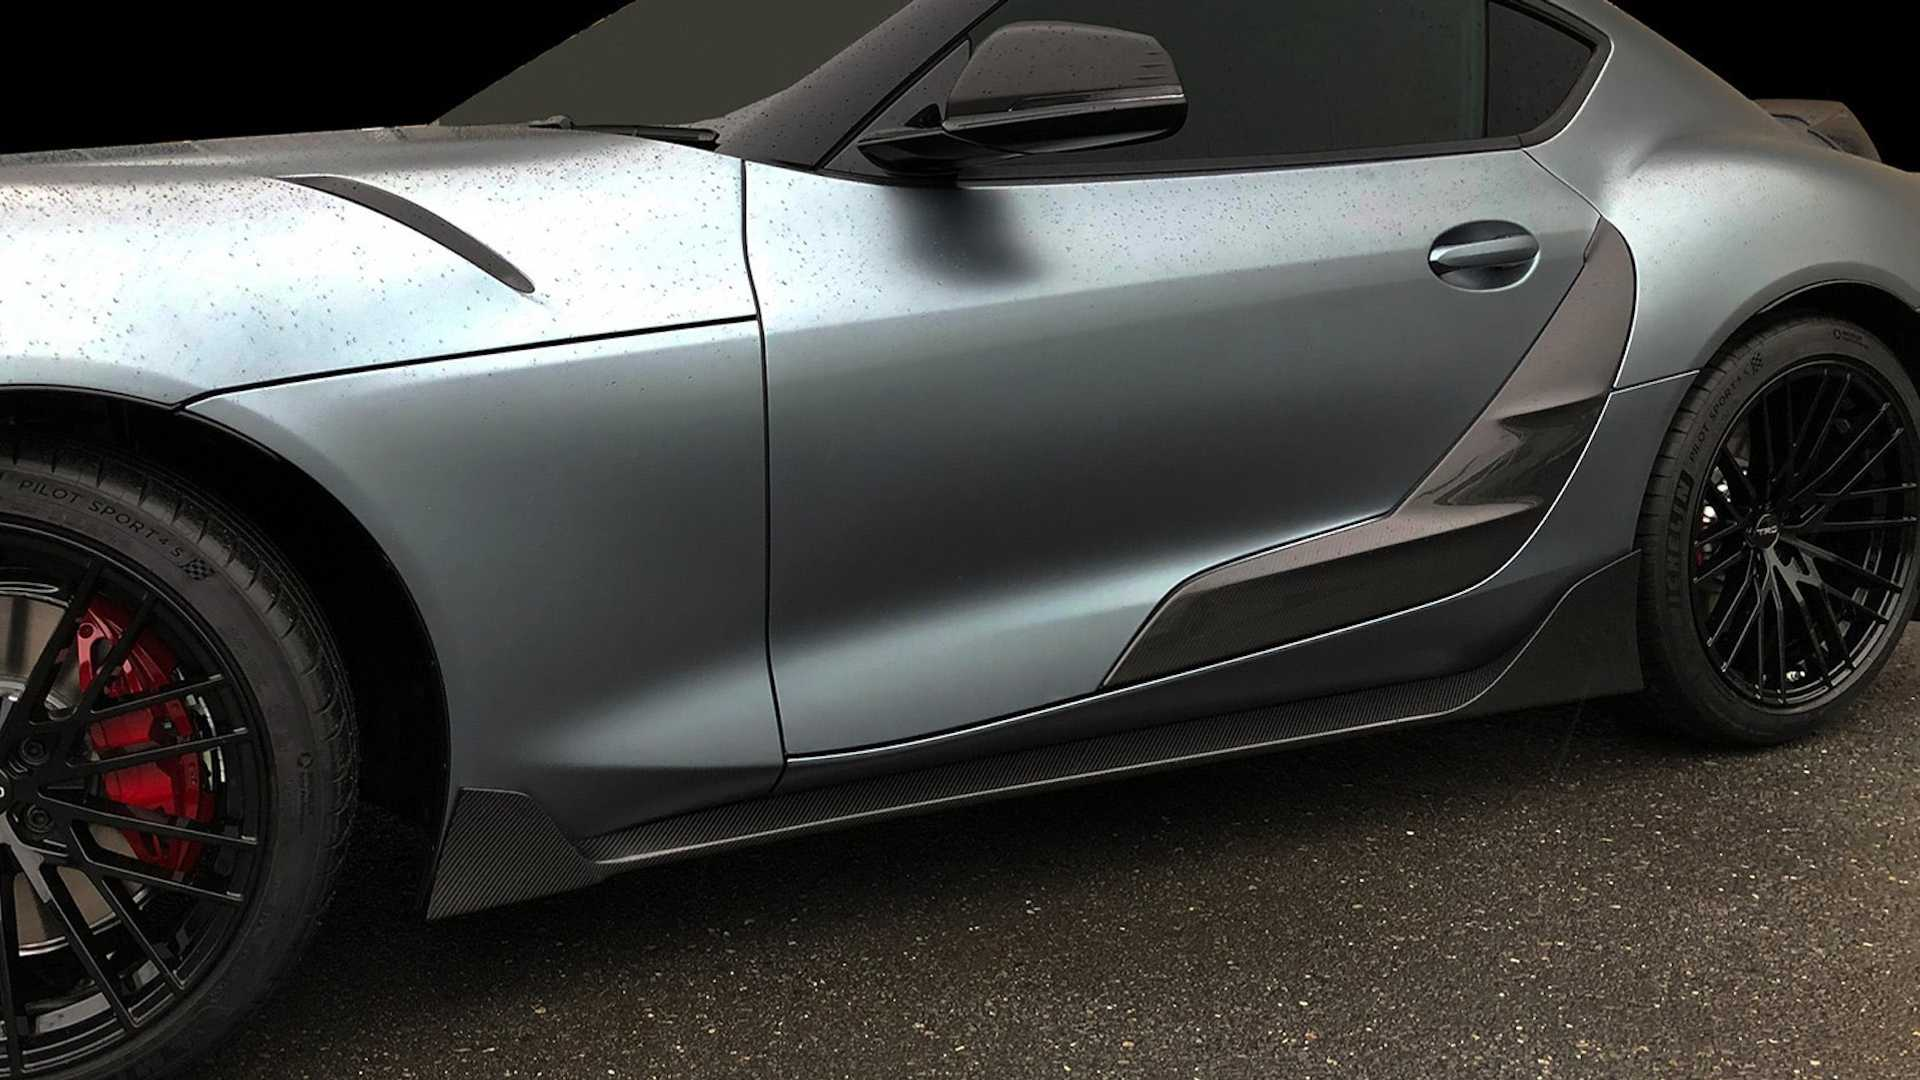 toyota-supra-performance-line-concept-trd (4)